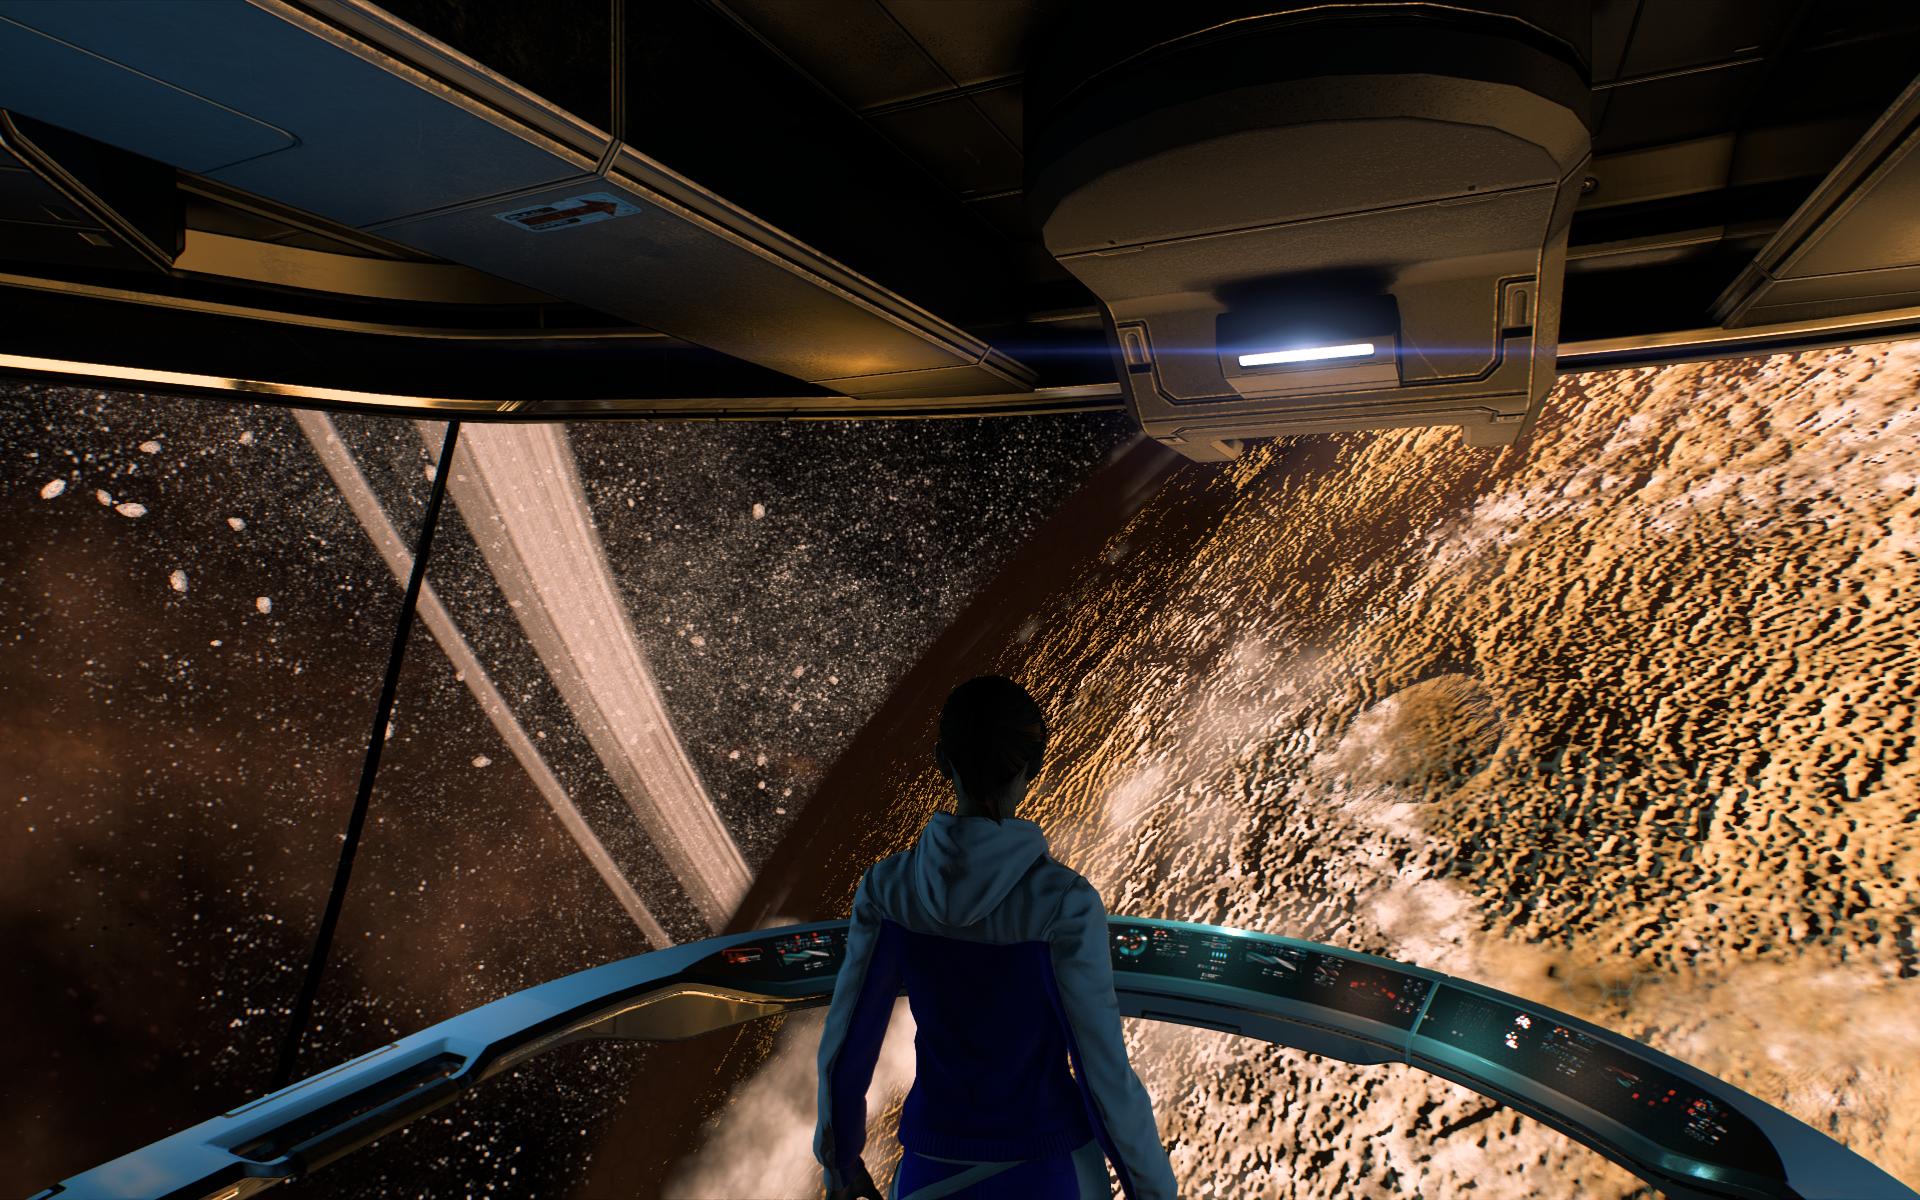 Mass Effect Andromeda Screenshot  - 19.25.21.92.png - Mass Effect: Andromeda